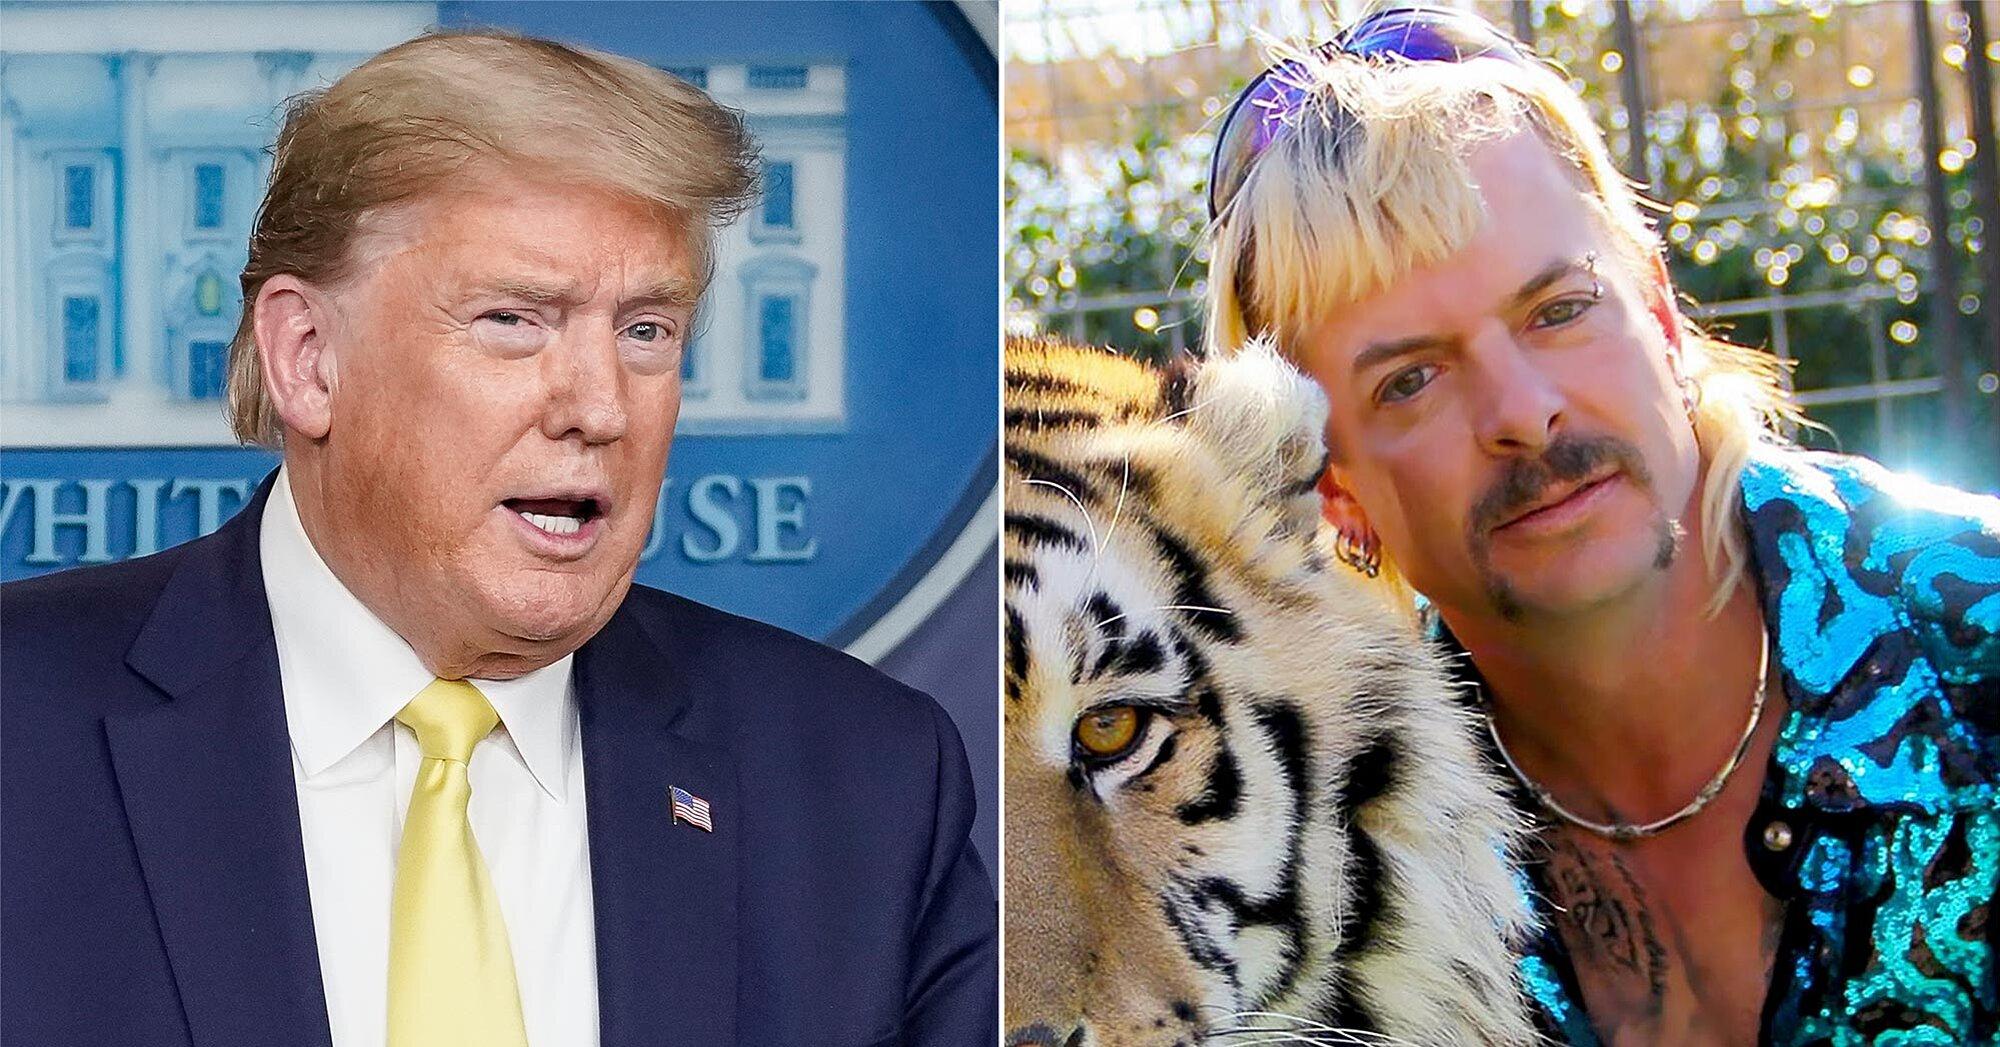 Trump asked if he'd pardon Joe Exotic during coronavirus press briefing